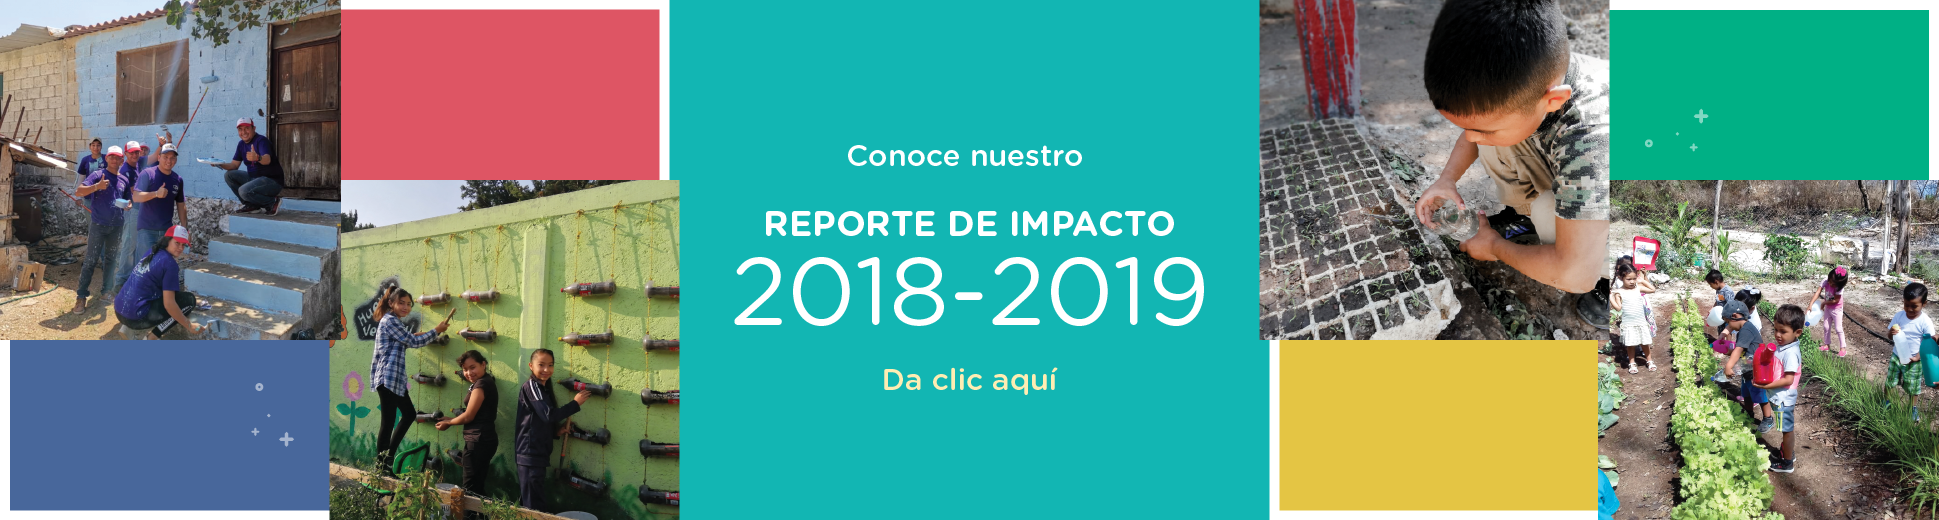 Reporte impacto